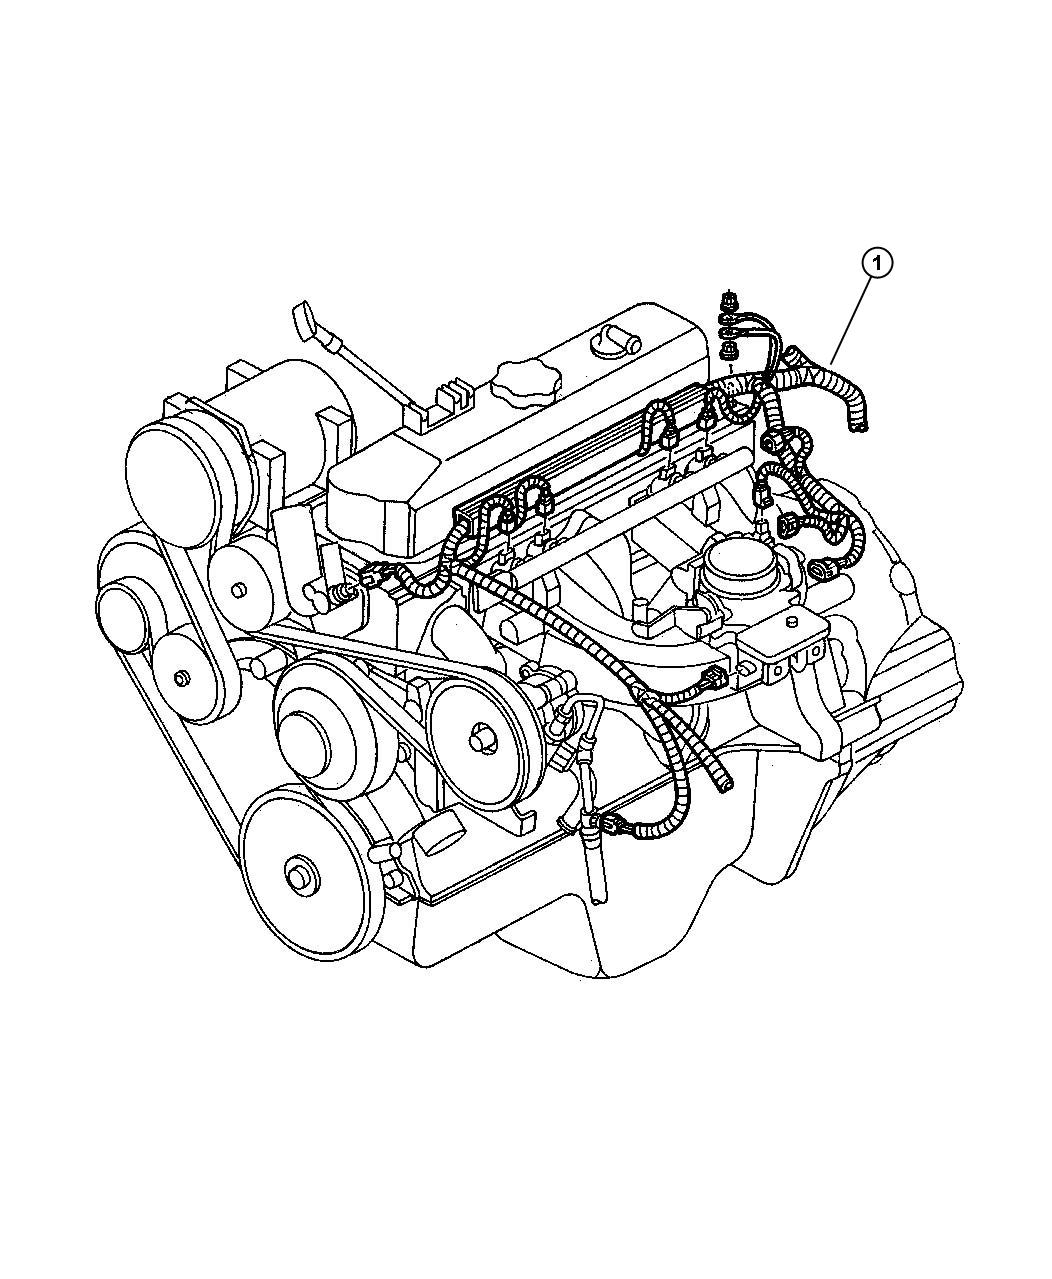 Dodge Dakota Wiring Engine Federal And Export U S 50